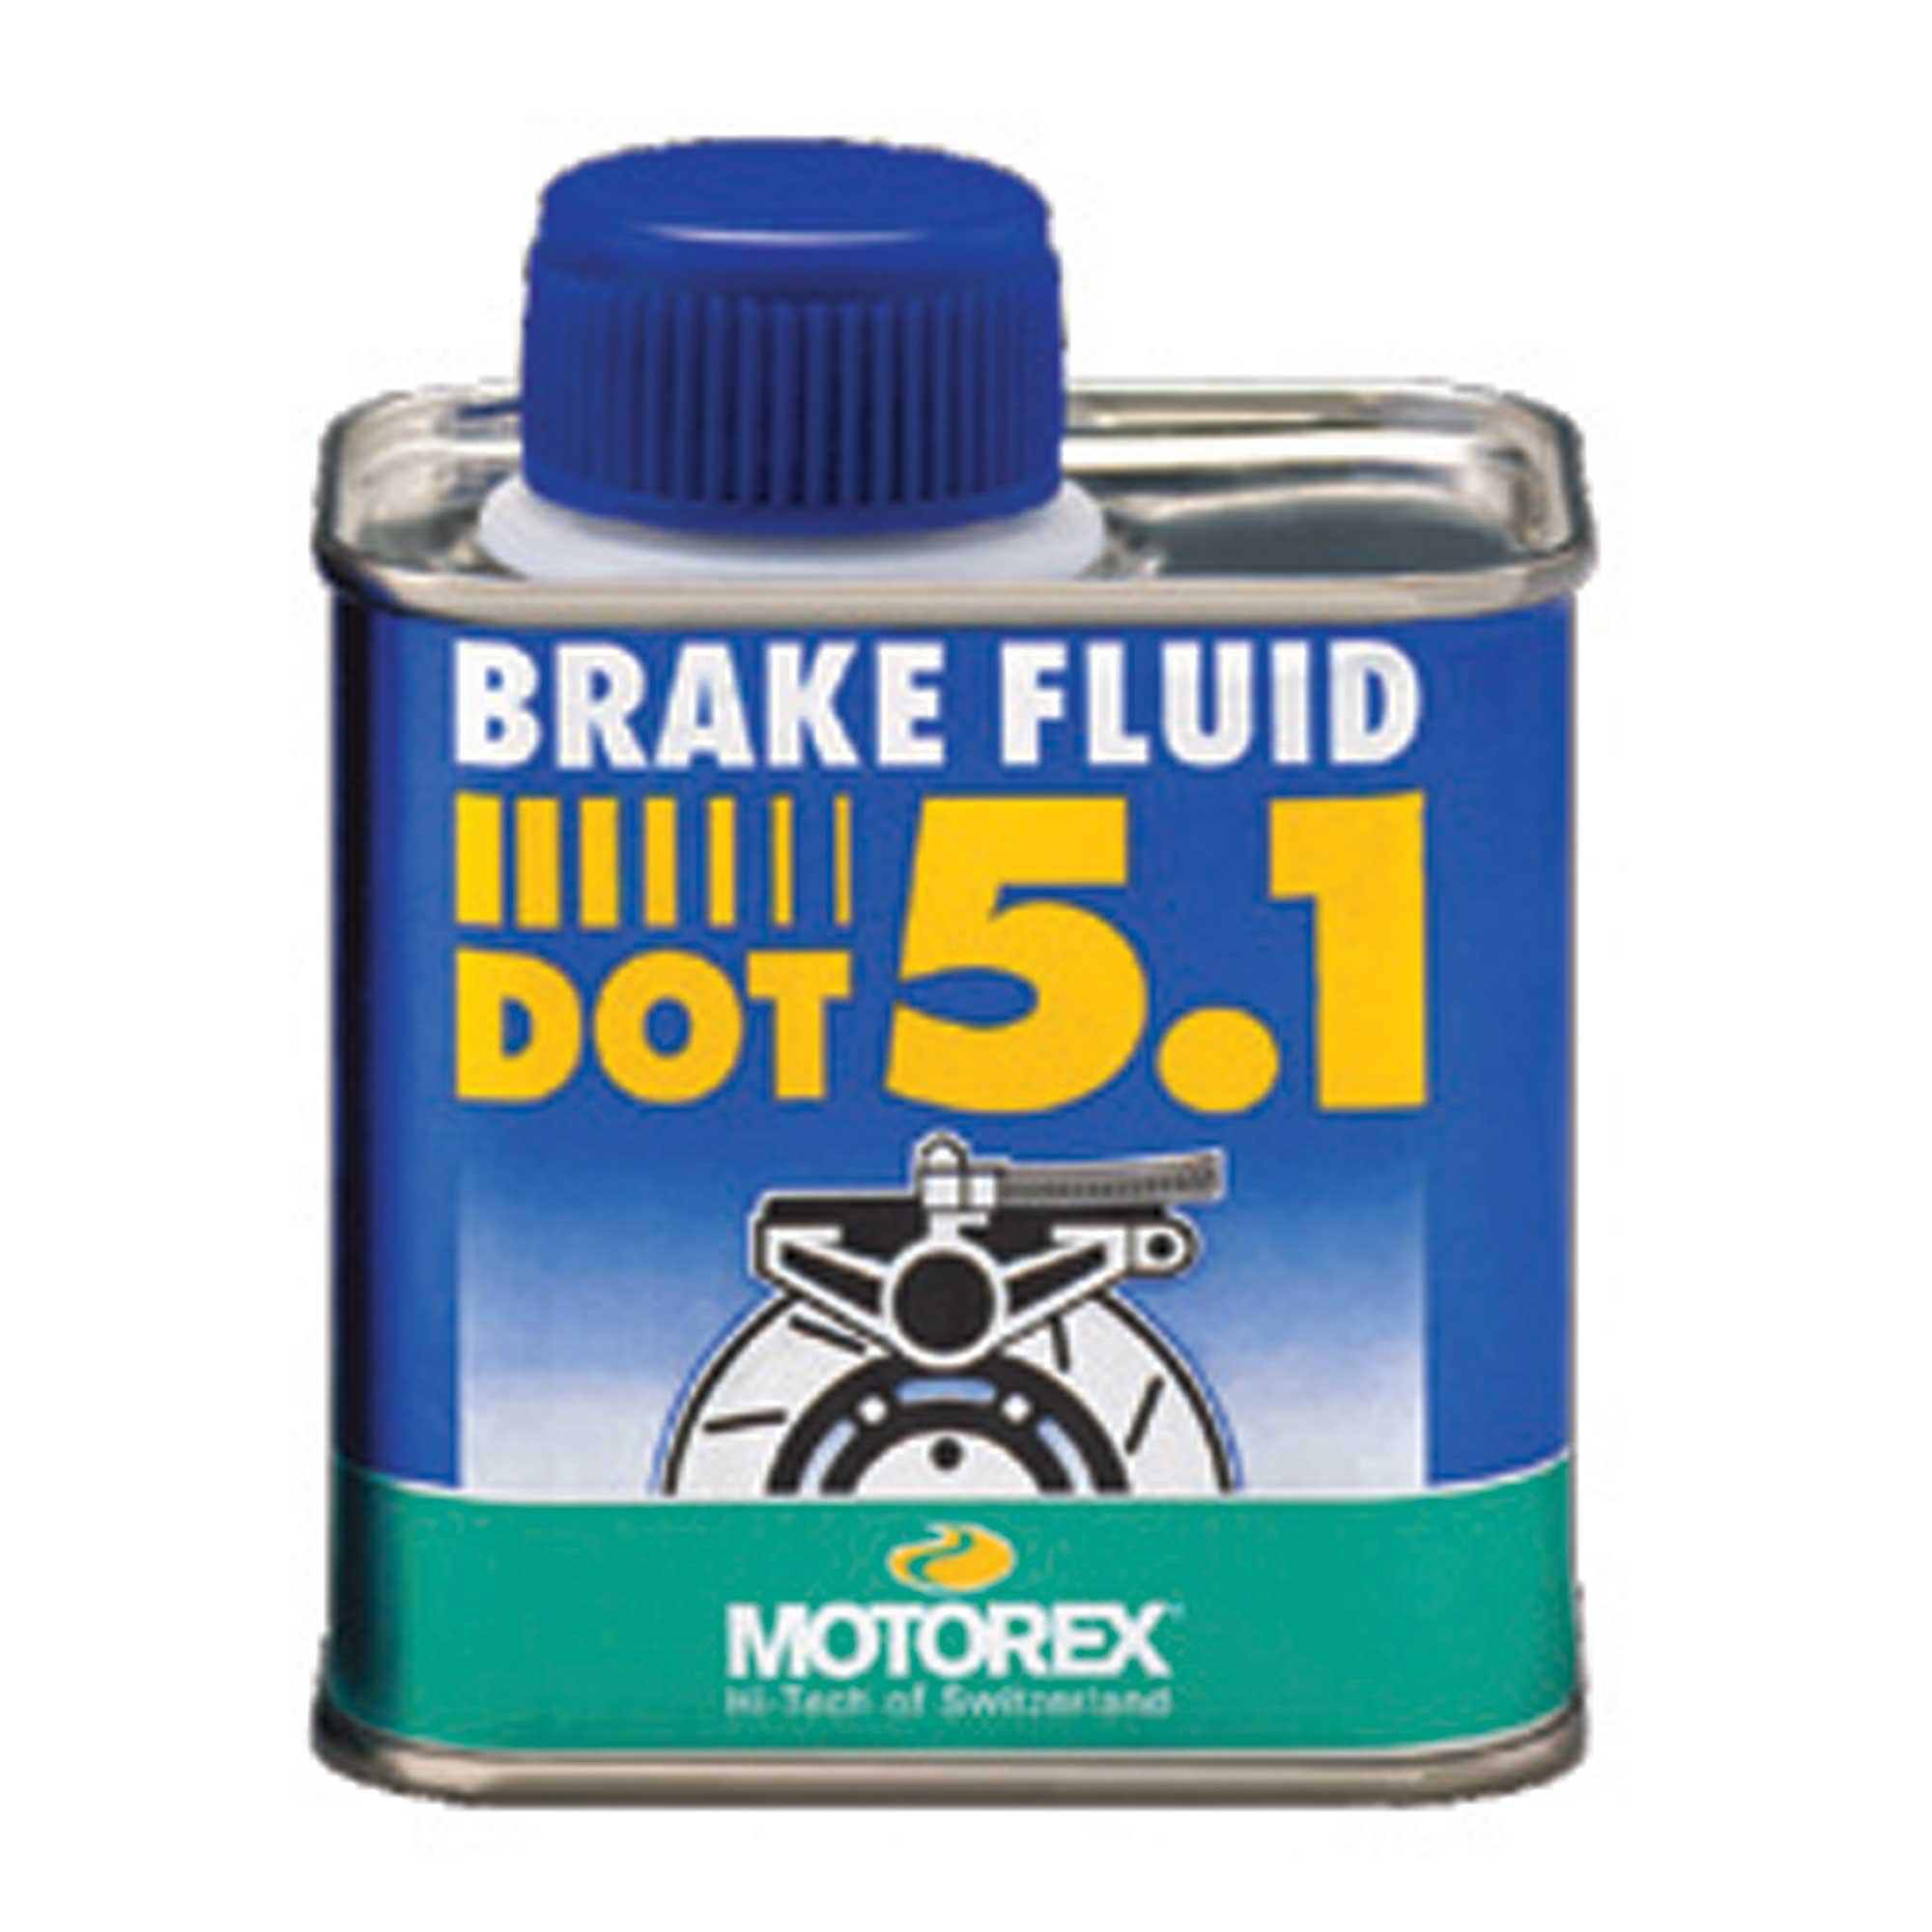 Dot 5 1 Brake Fluid >> Motorex Synthetic Motorcycle Motorbike Bike Brake Fluid Dot5 1